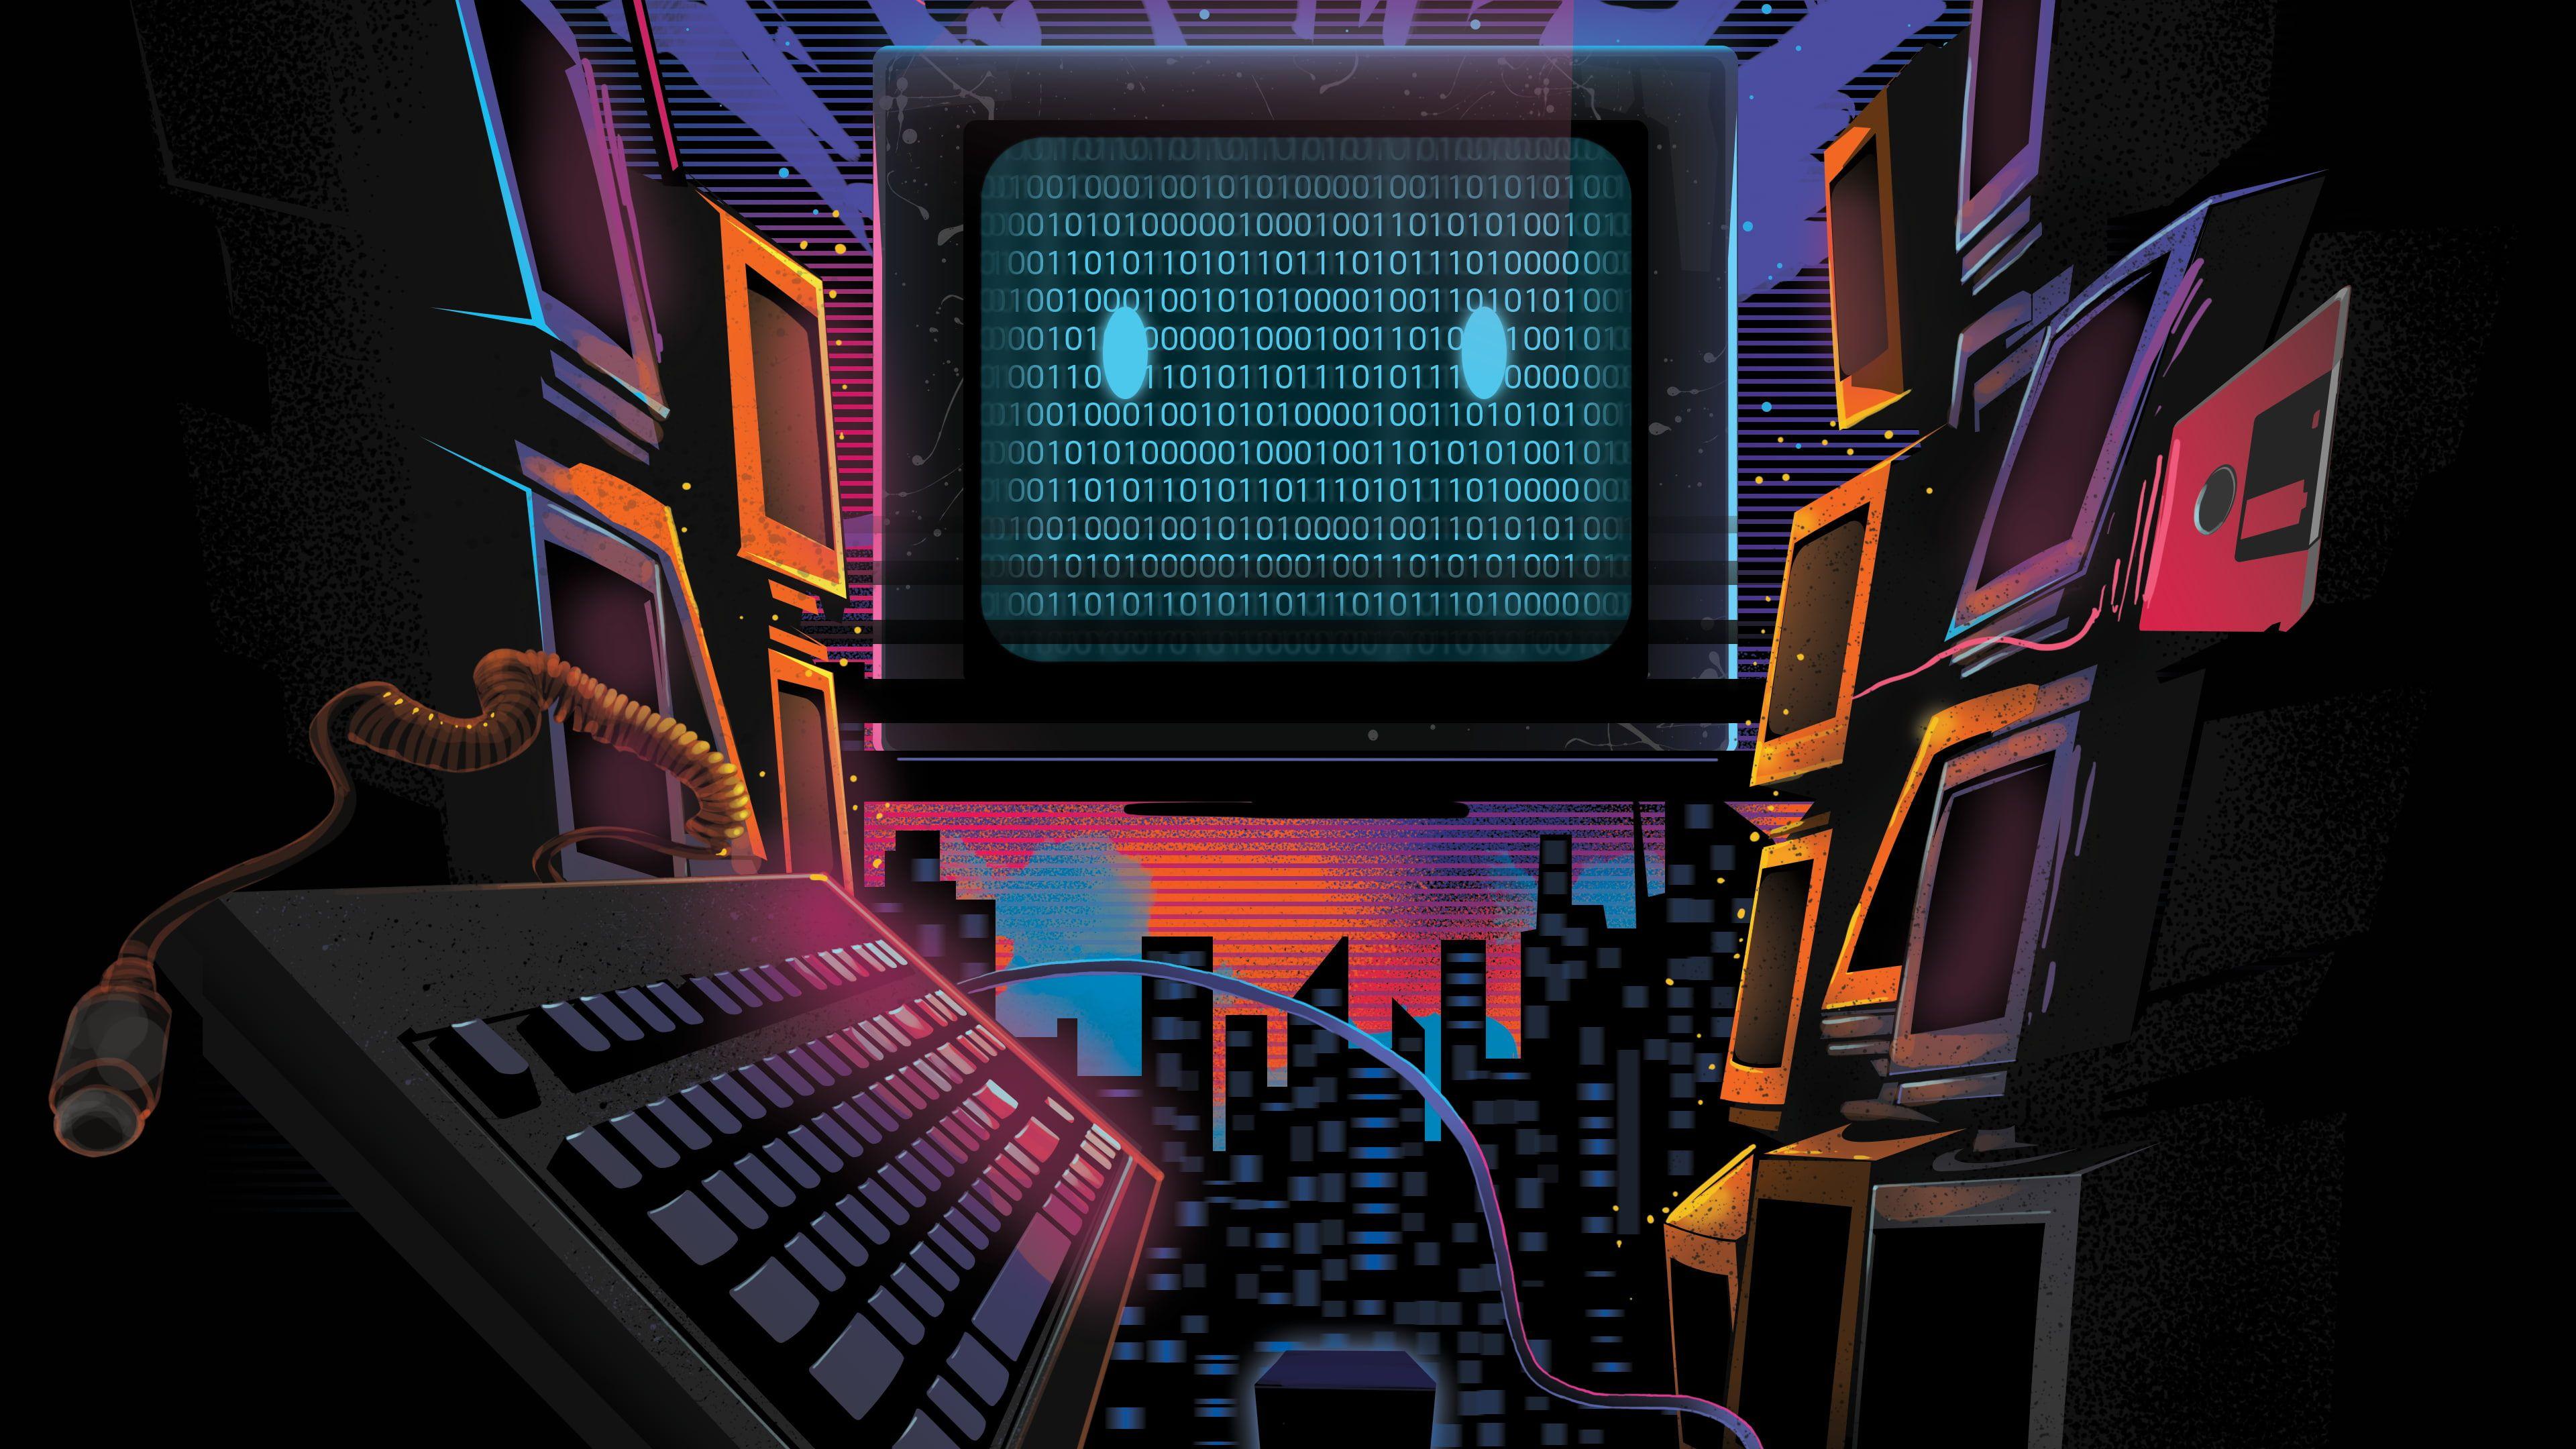 Technology Monitor Alpha Coders Binary Crt Monitor Retro Wave 4k Wallpaper Hdwallpaper Deskt In 2020 Waves Wallpaper Retro Games Wallpaper Amazing Hd Wallpapers